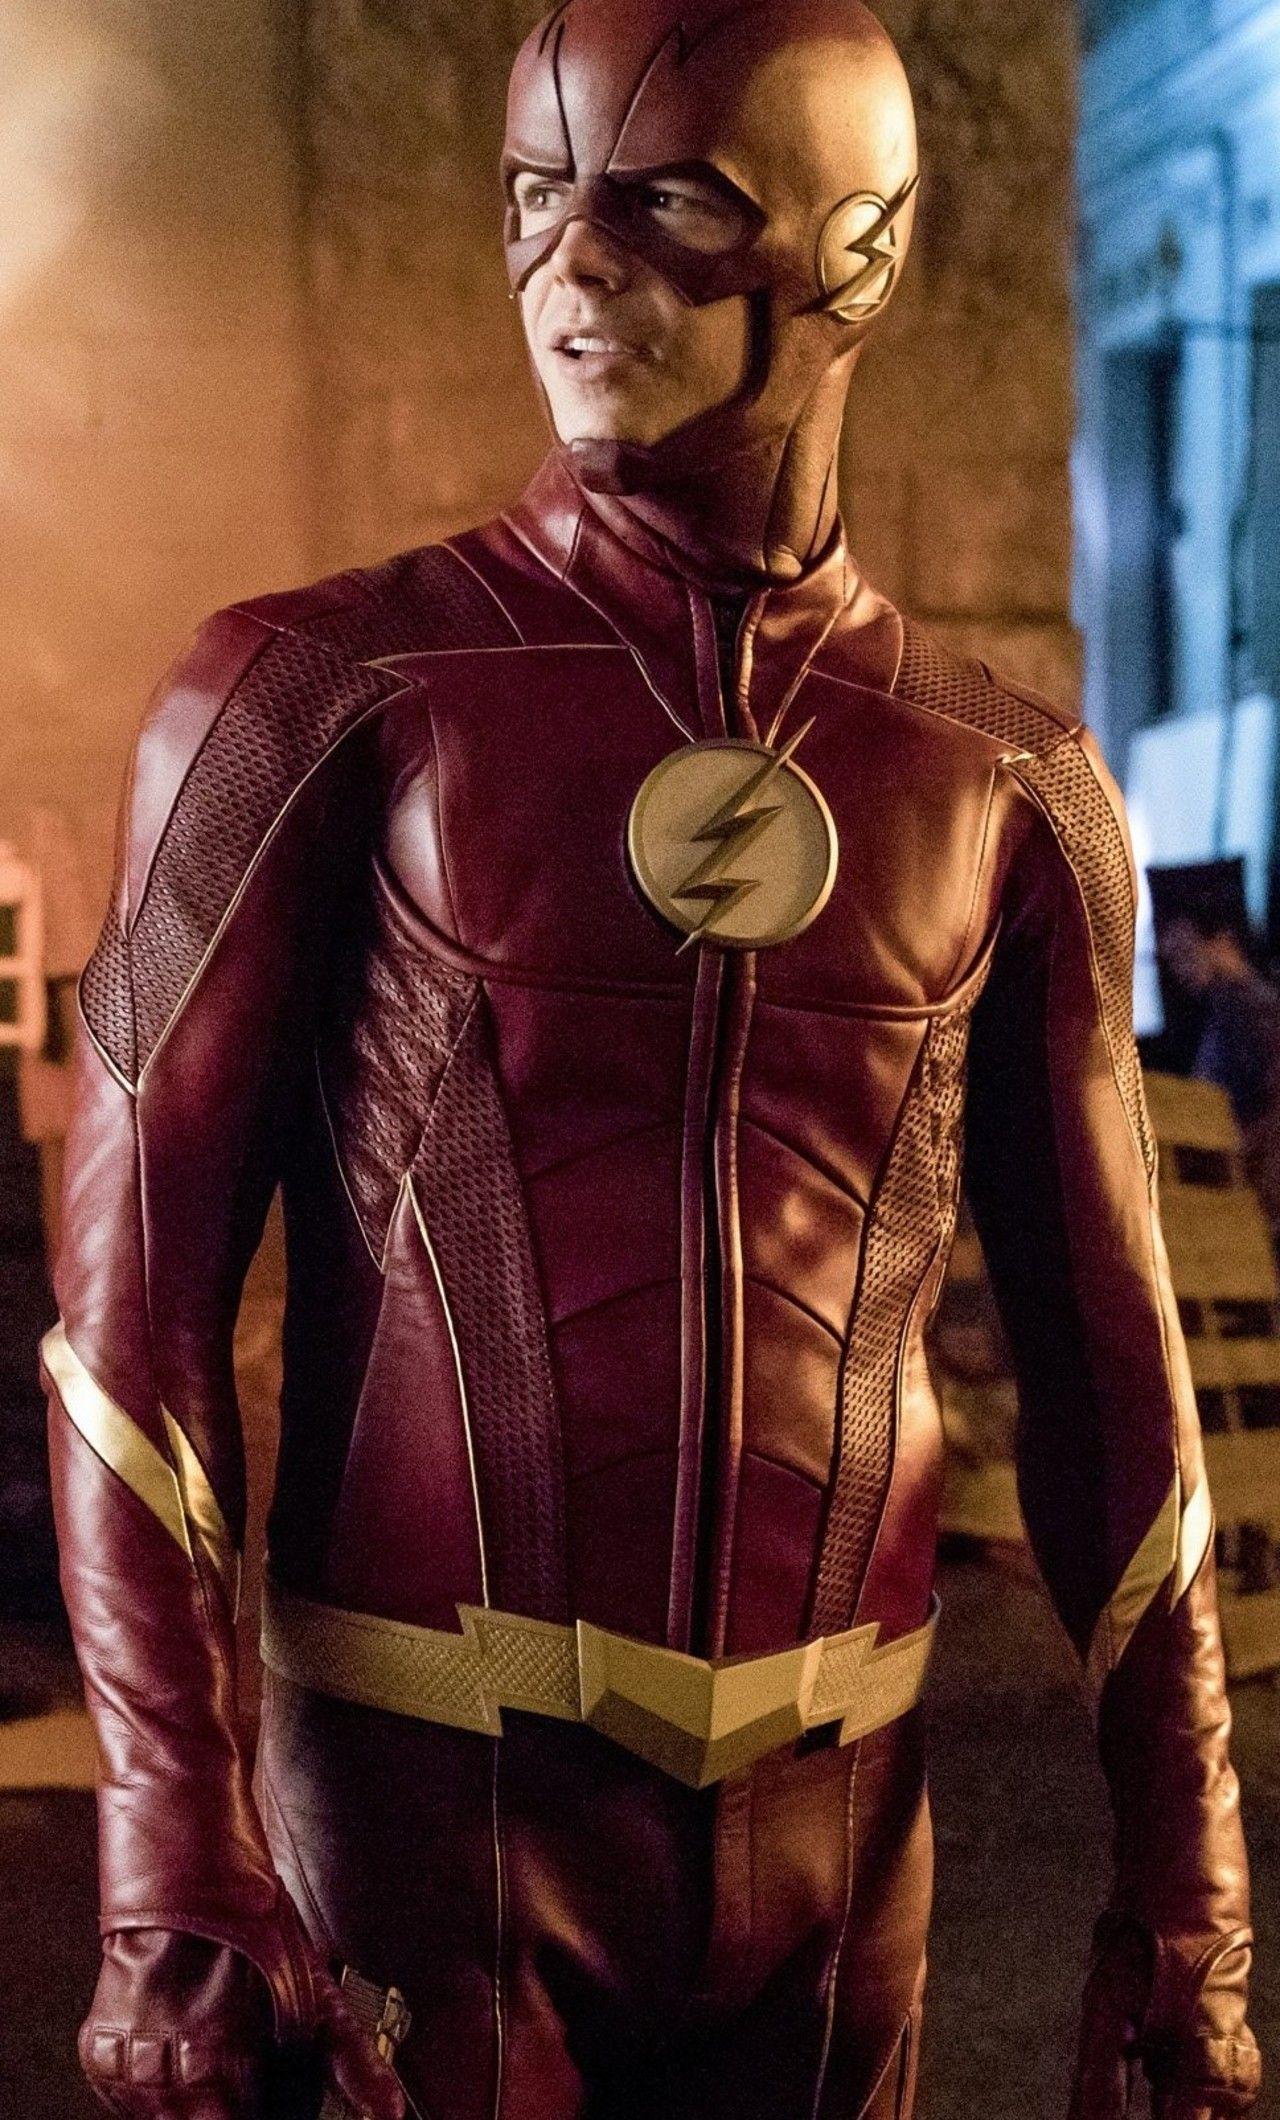 Barry Allen As Flash In The Flash Season 4 2017 Iphone Flash Season 6 Suit 1280x2120 Wallpaper Teahub Io